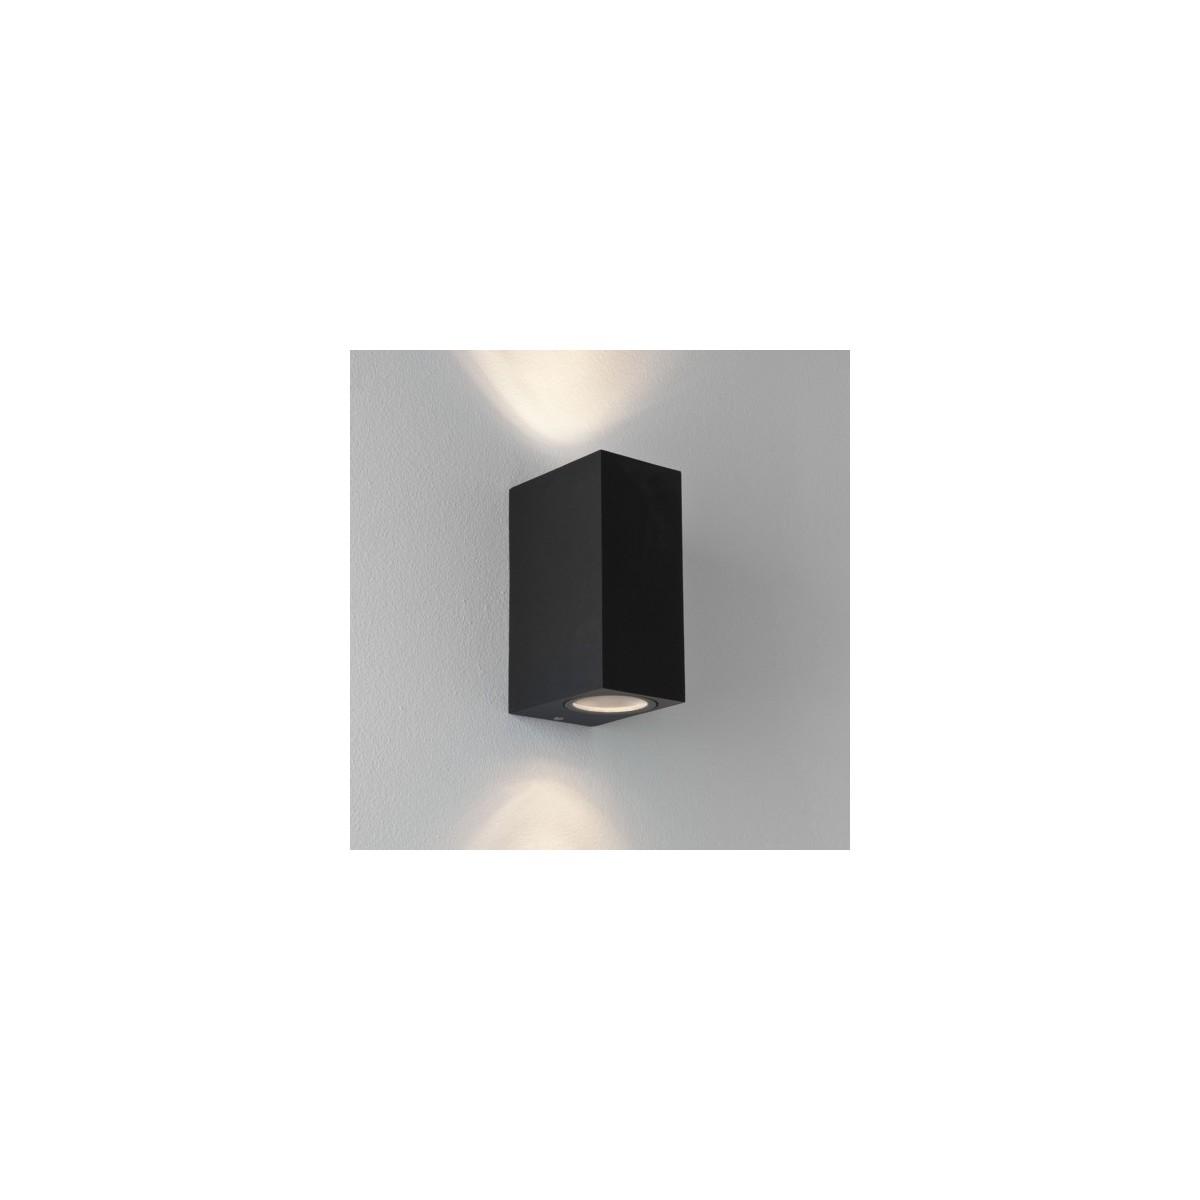 Astro Chios 150 Ścienna 2x6W Max LED GU10 Czarny Struktura IP44 1310004